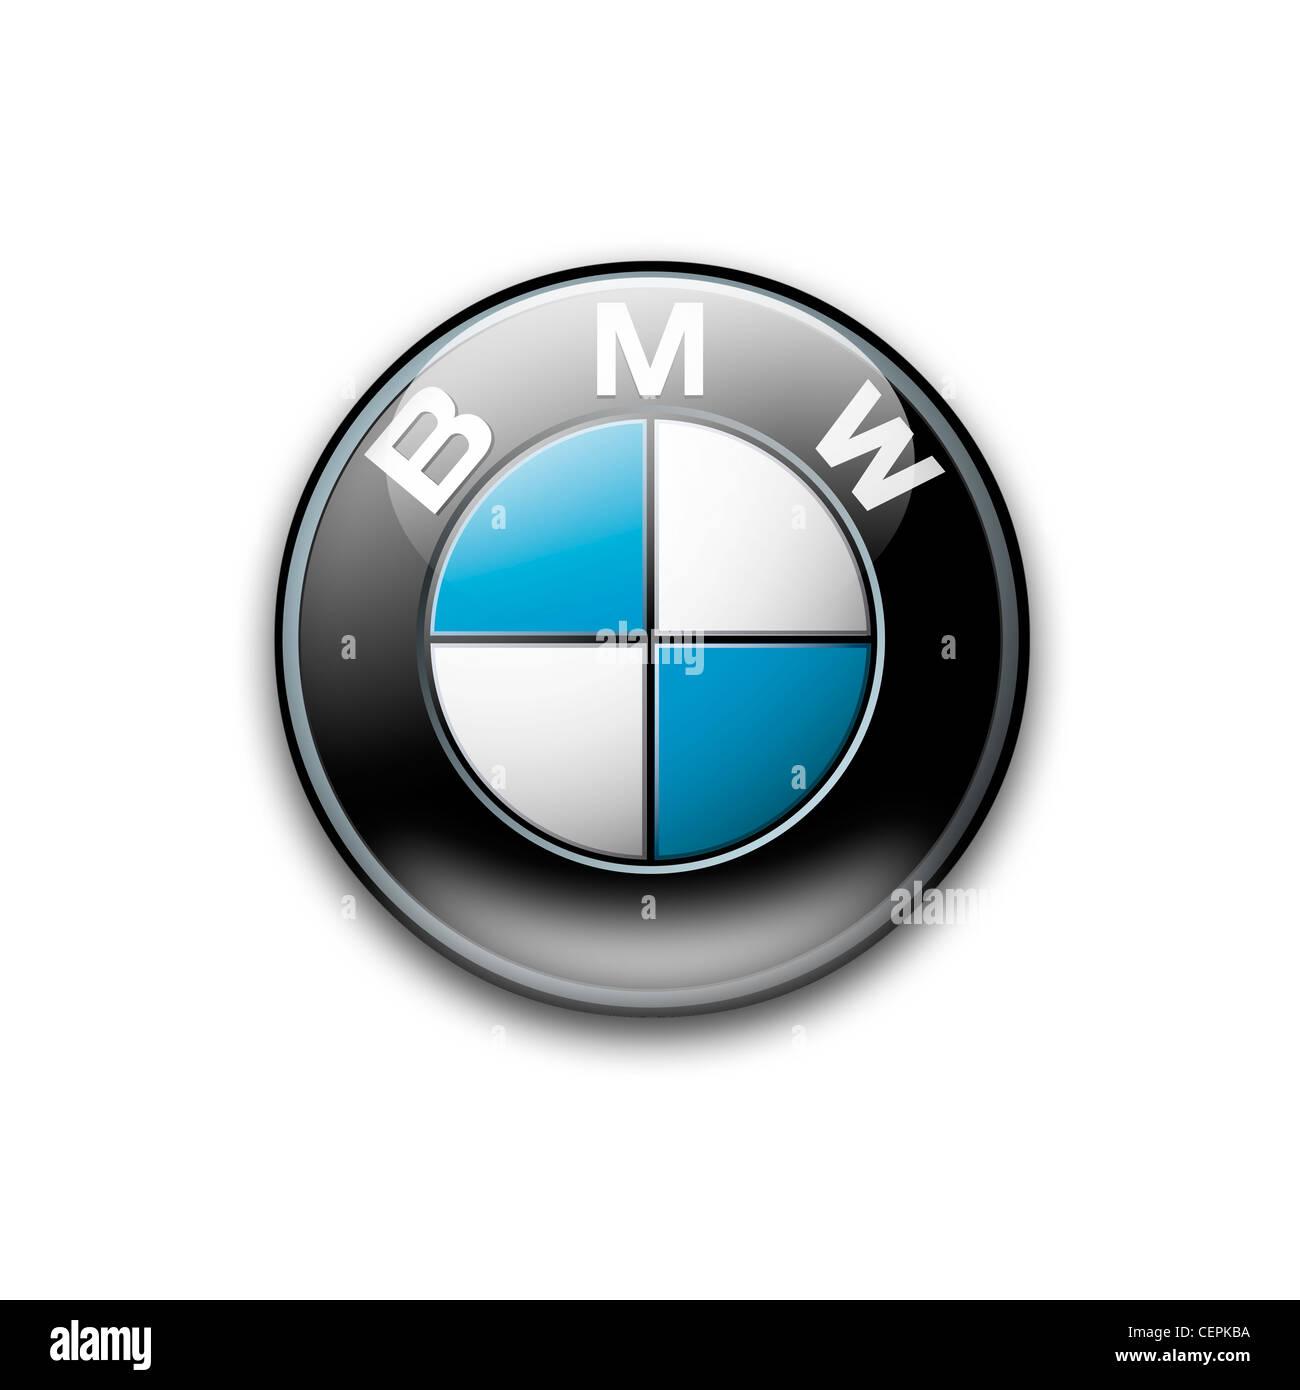 BMW logo symbol icon - Stock Image